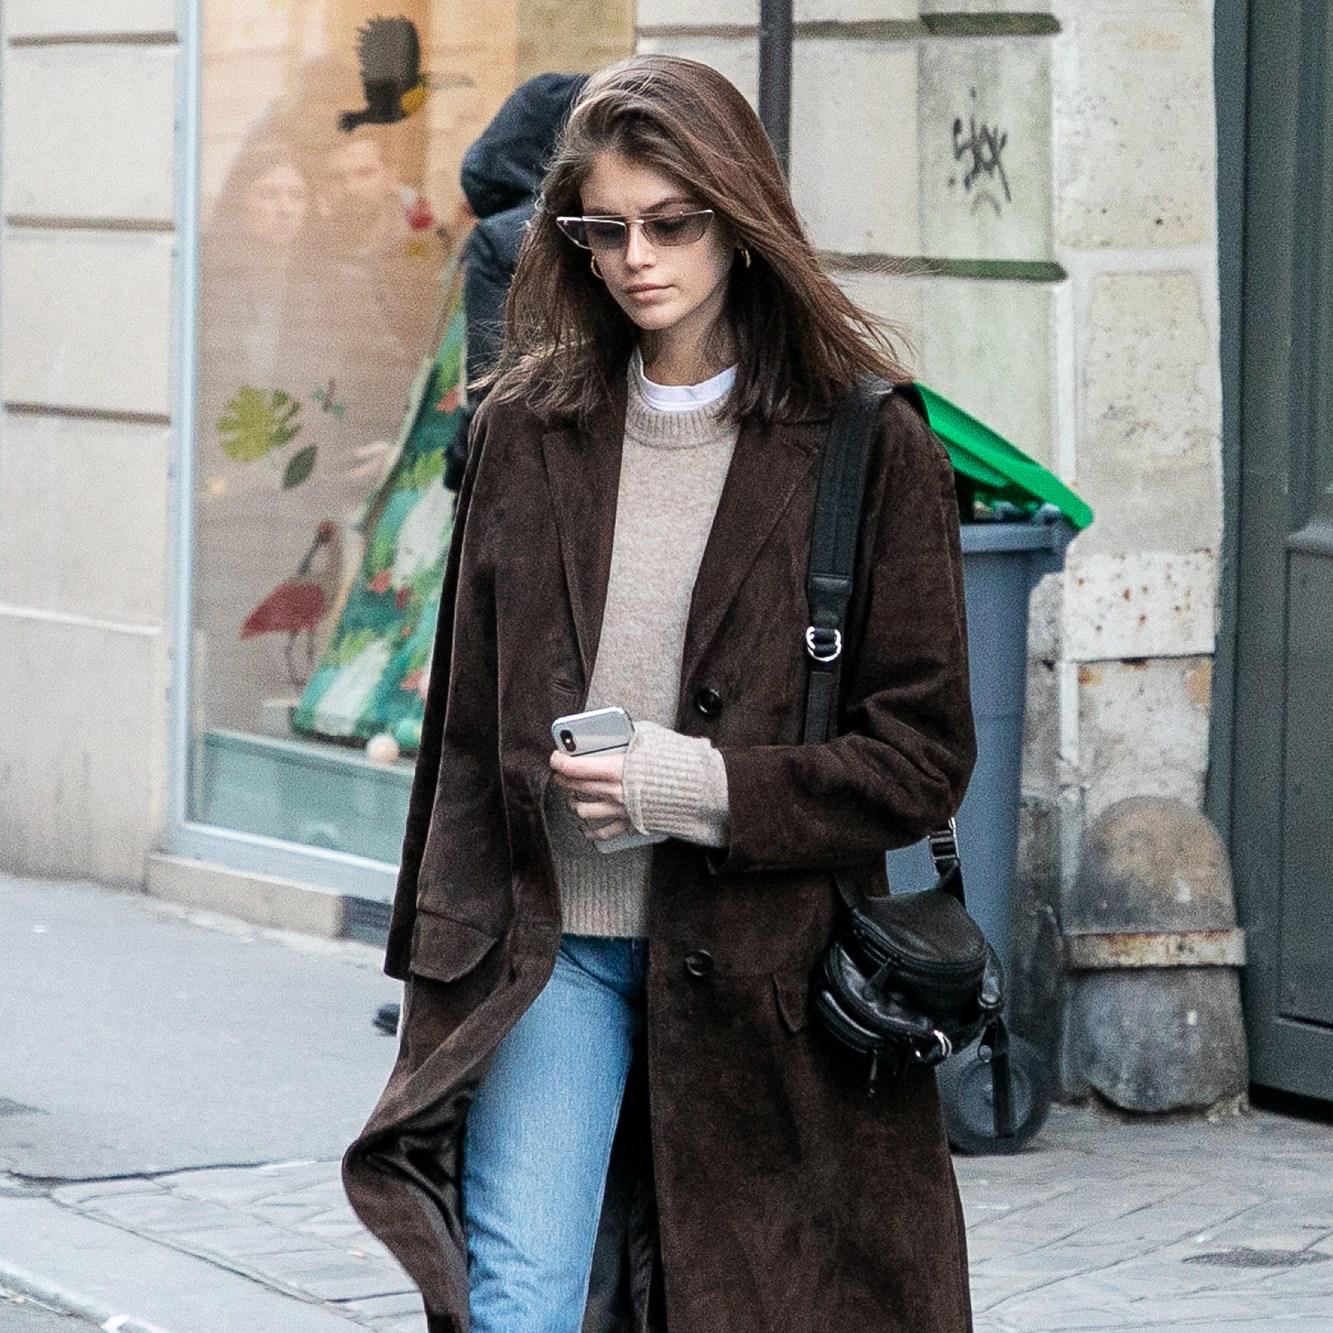 See the Best Celebrity Street Style From Paris Menswear Fall-Winter 2019 Fashion Week